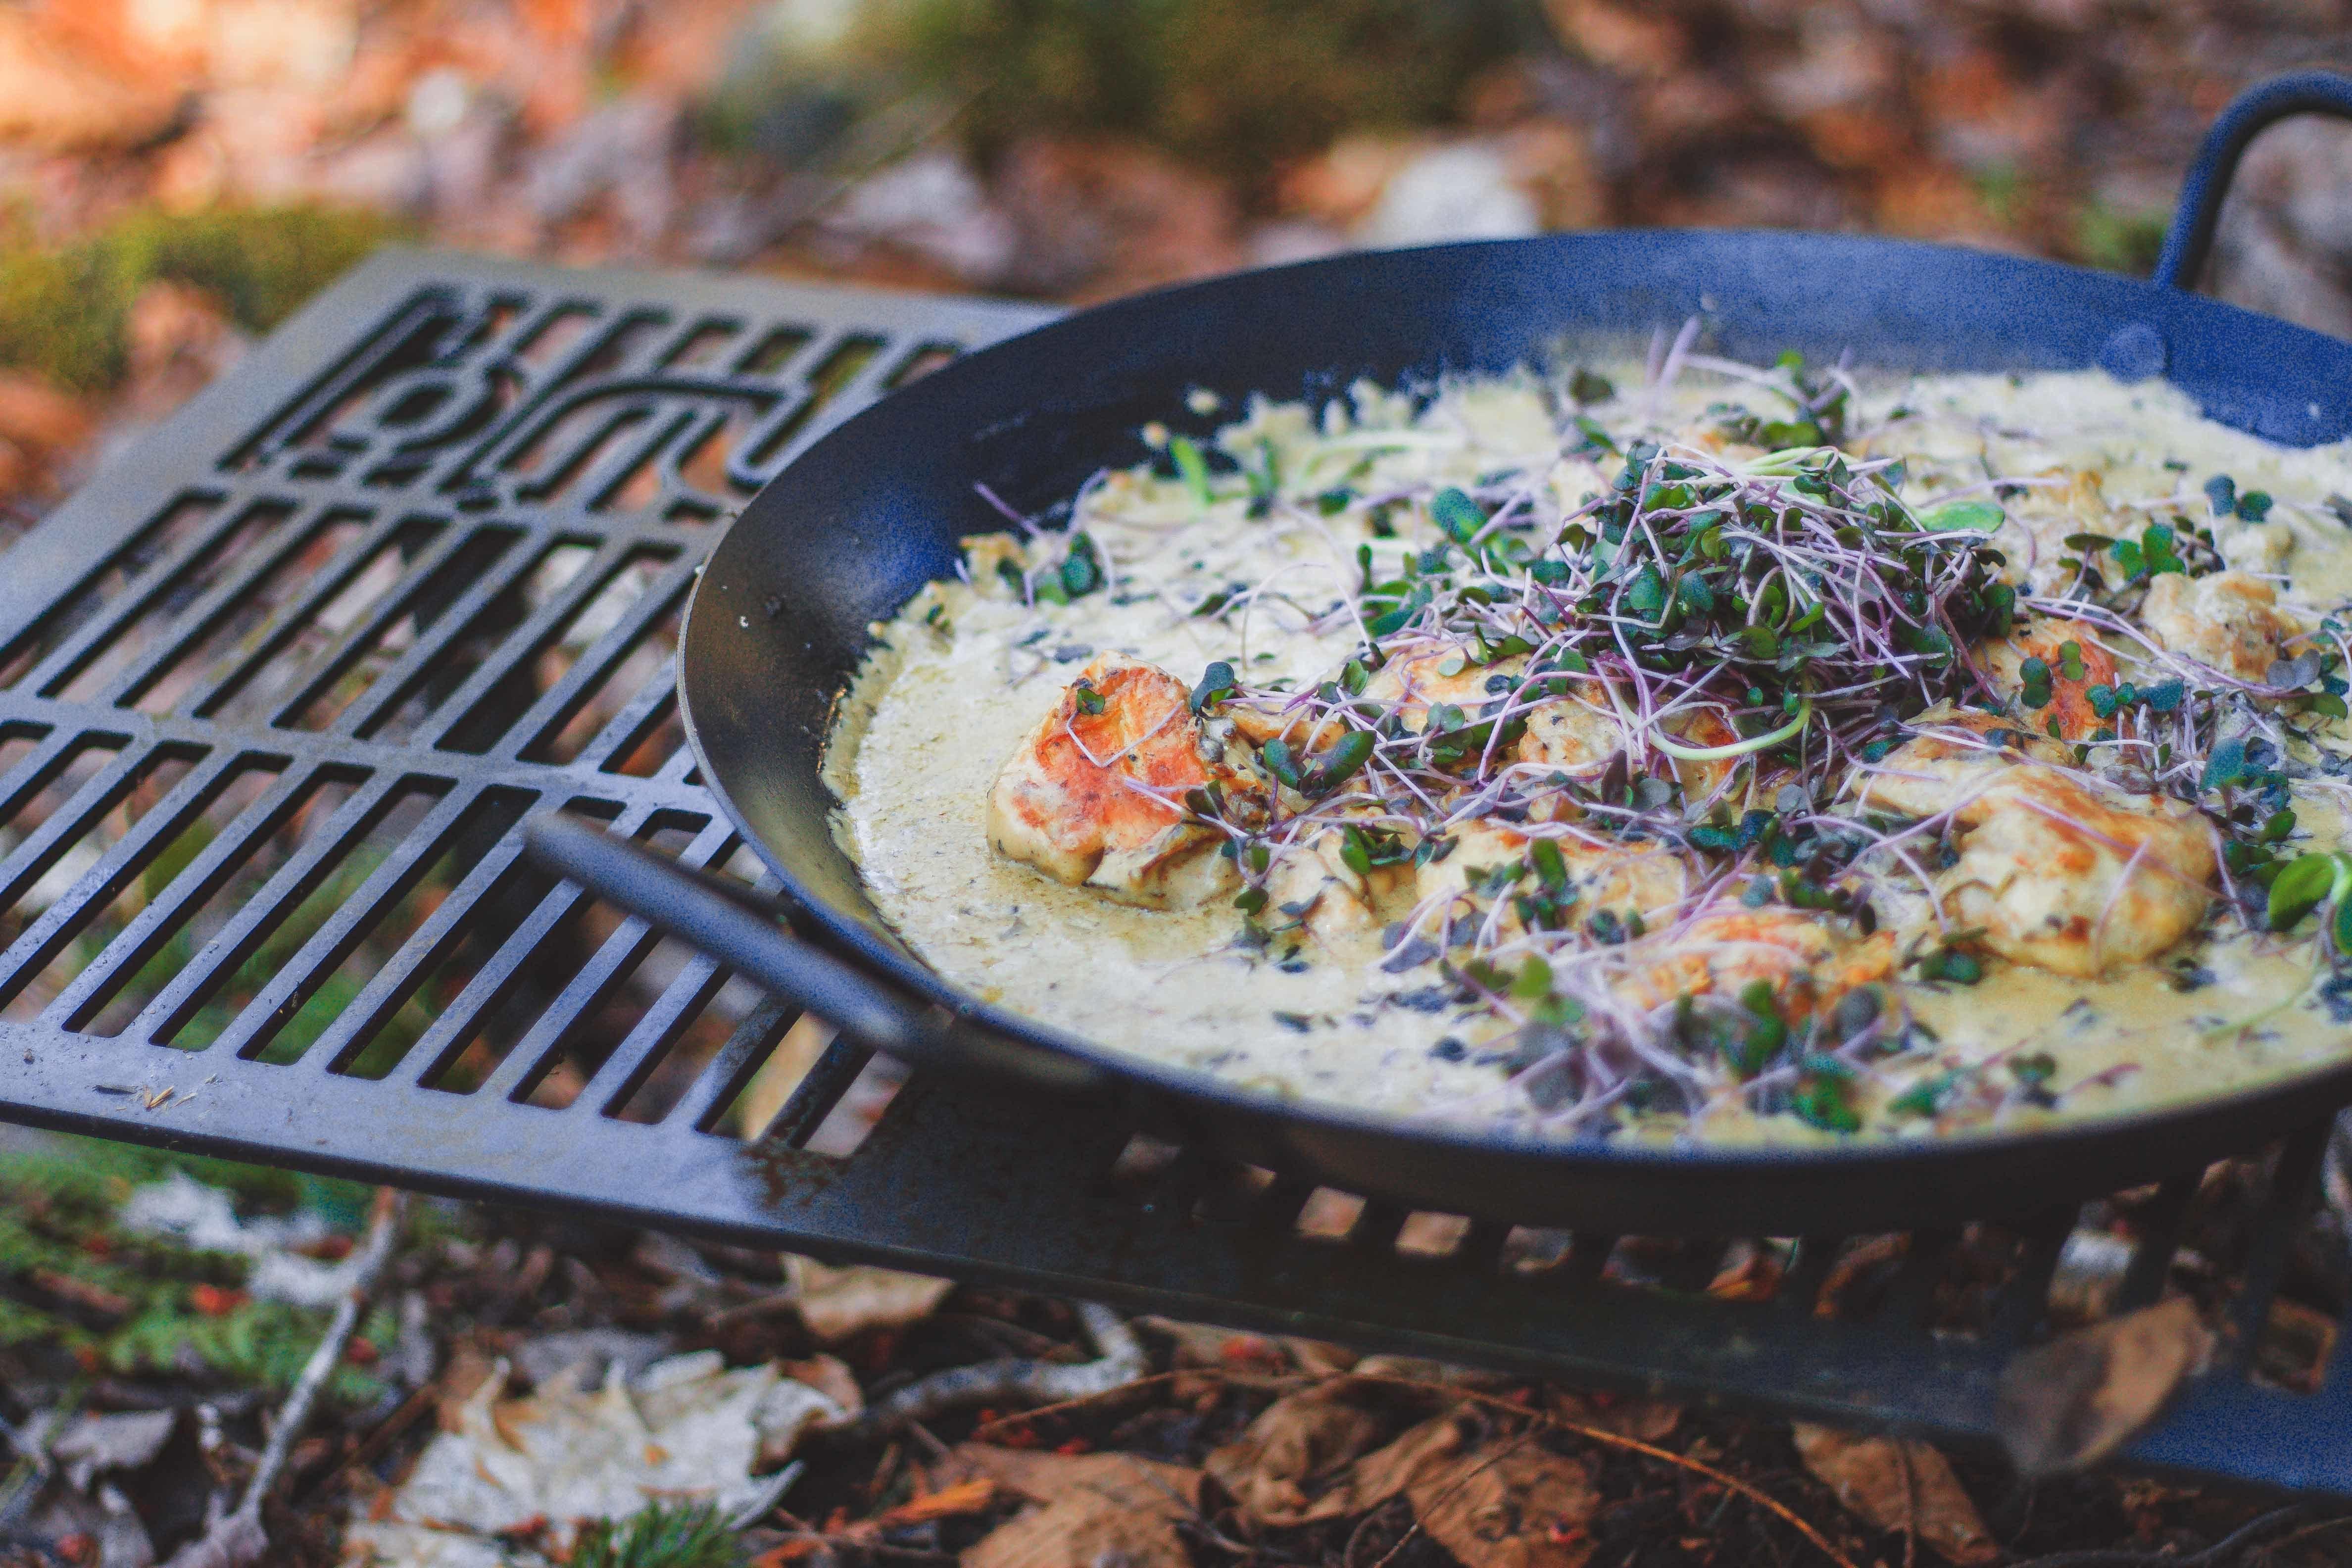 Hauts de cuisse flambes a la creme de champignons IMG 9431